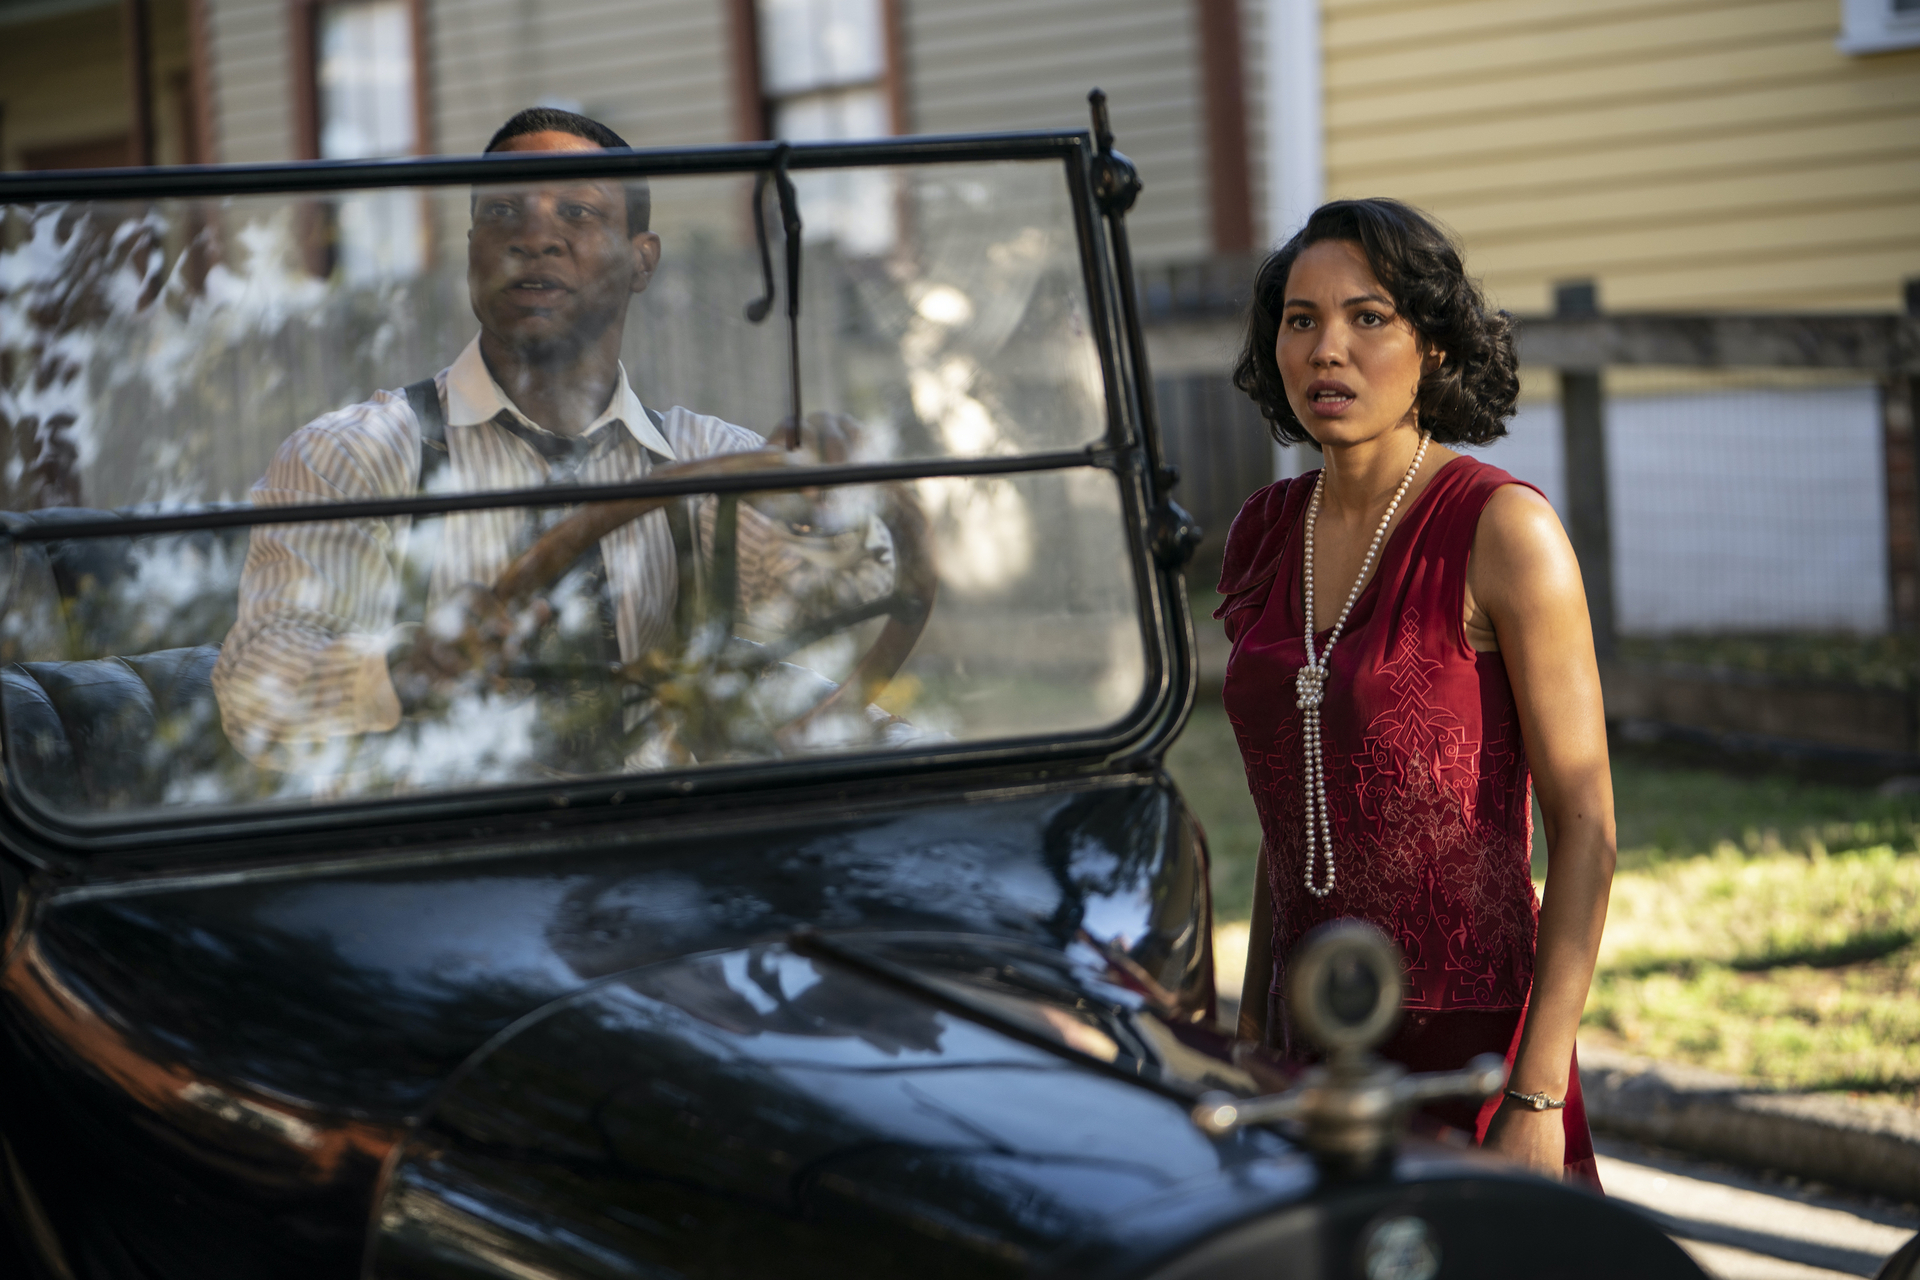 Jonathan Majors, Jurnee Smollett, HBO Lovecraft Country Season 1 - Episode 9